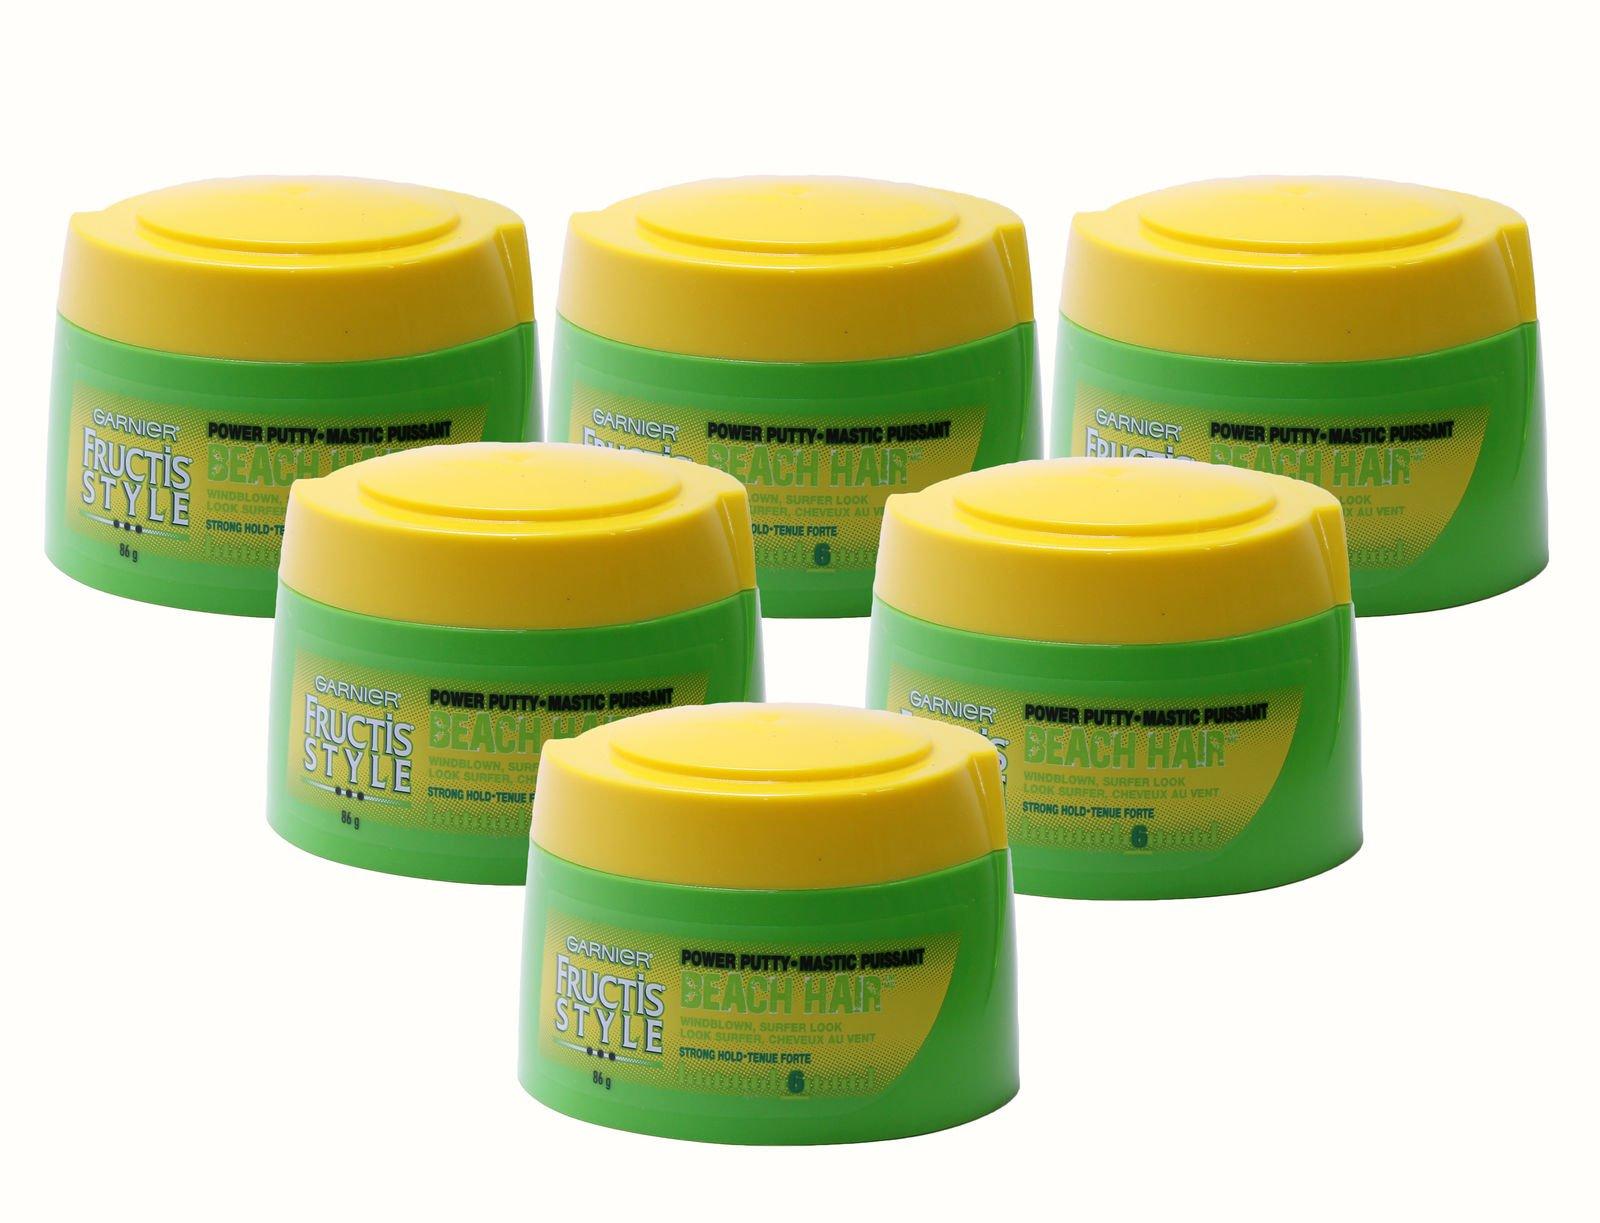 Garnier Fructis Style Beach Hair Power Putty, 3 Ounce (Pack of 6)